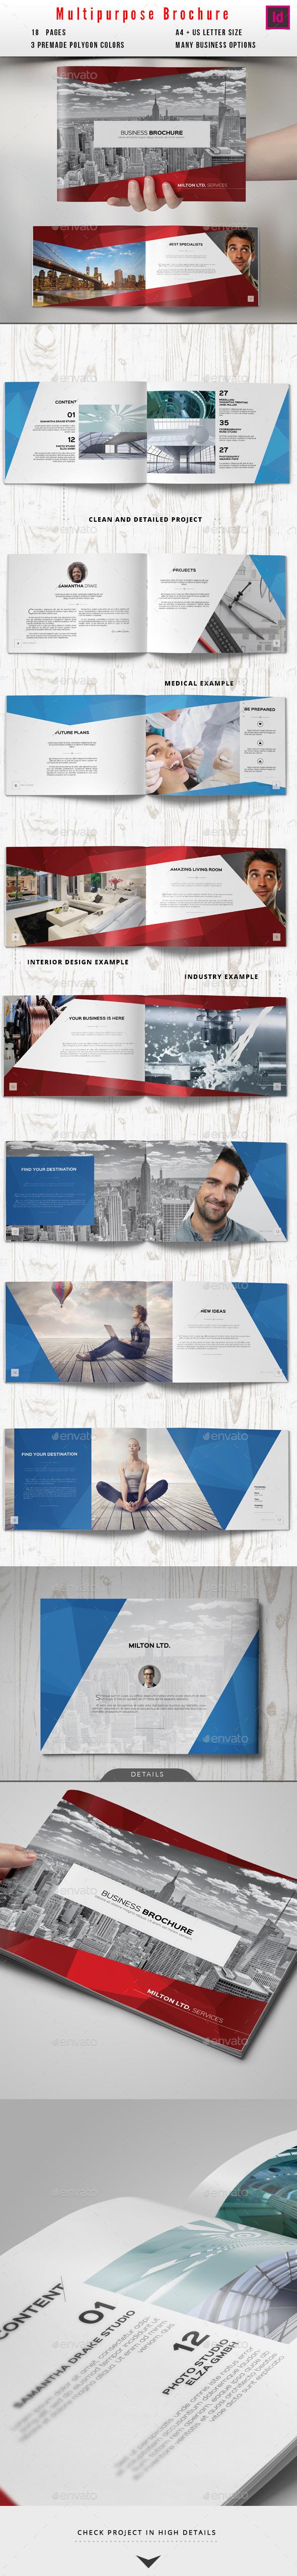 Multipurpose Business Catalog / Brochure - Corporate Brochures